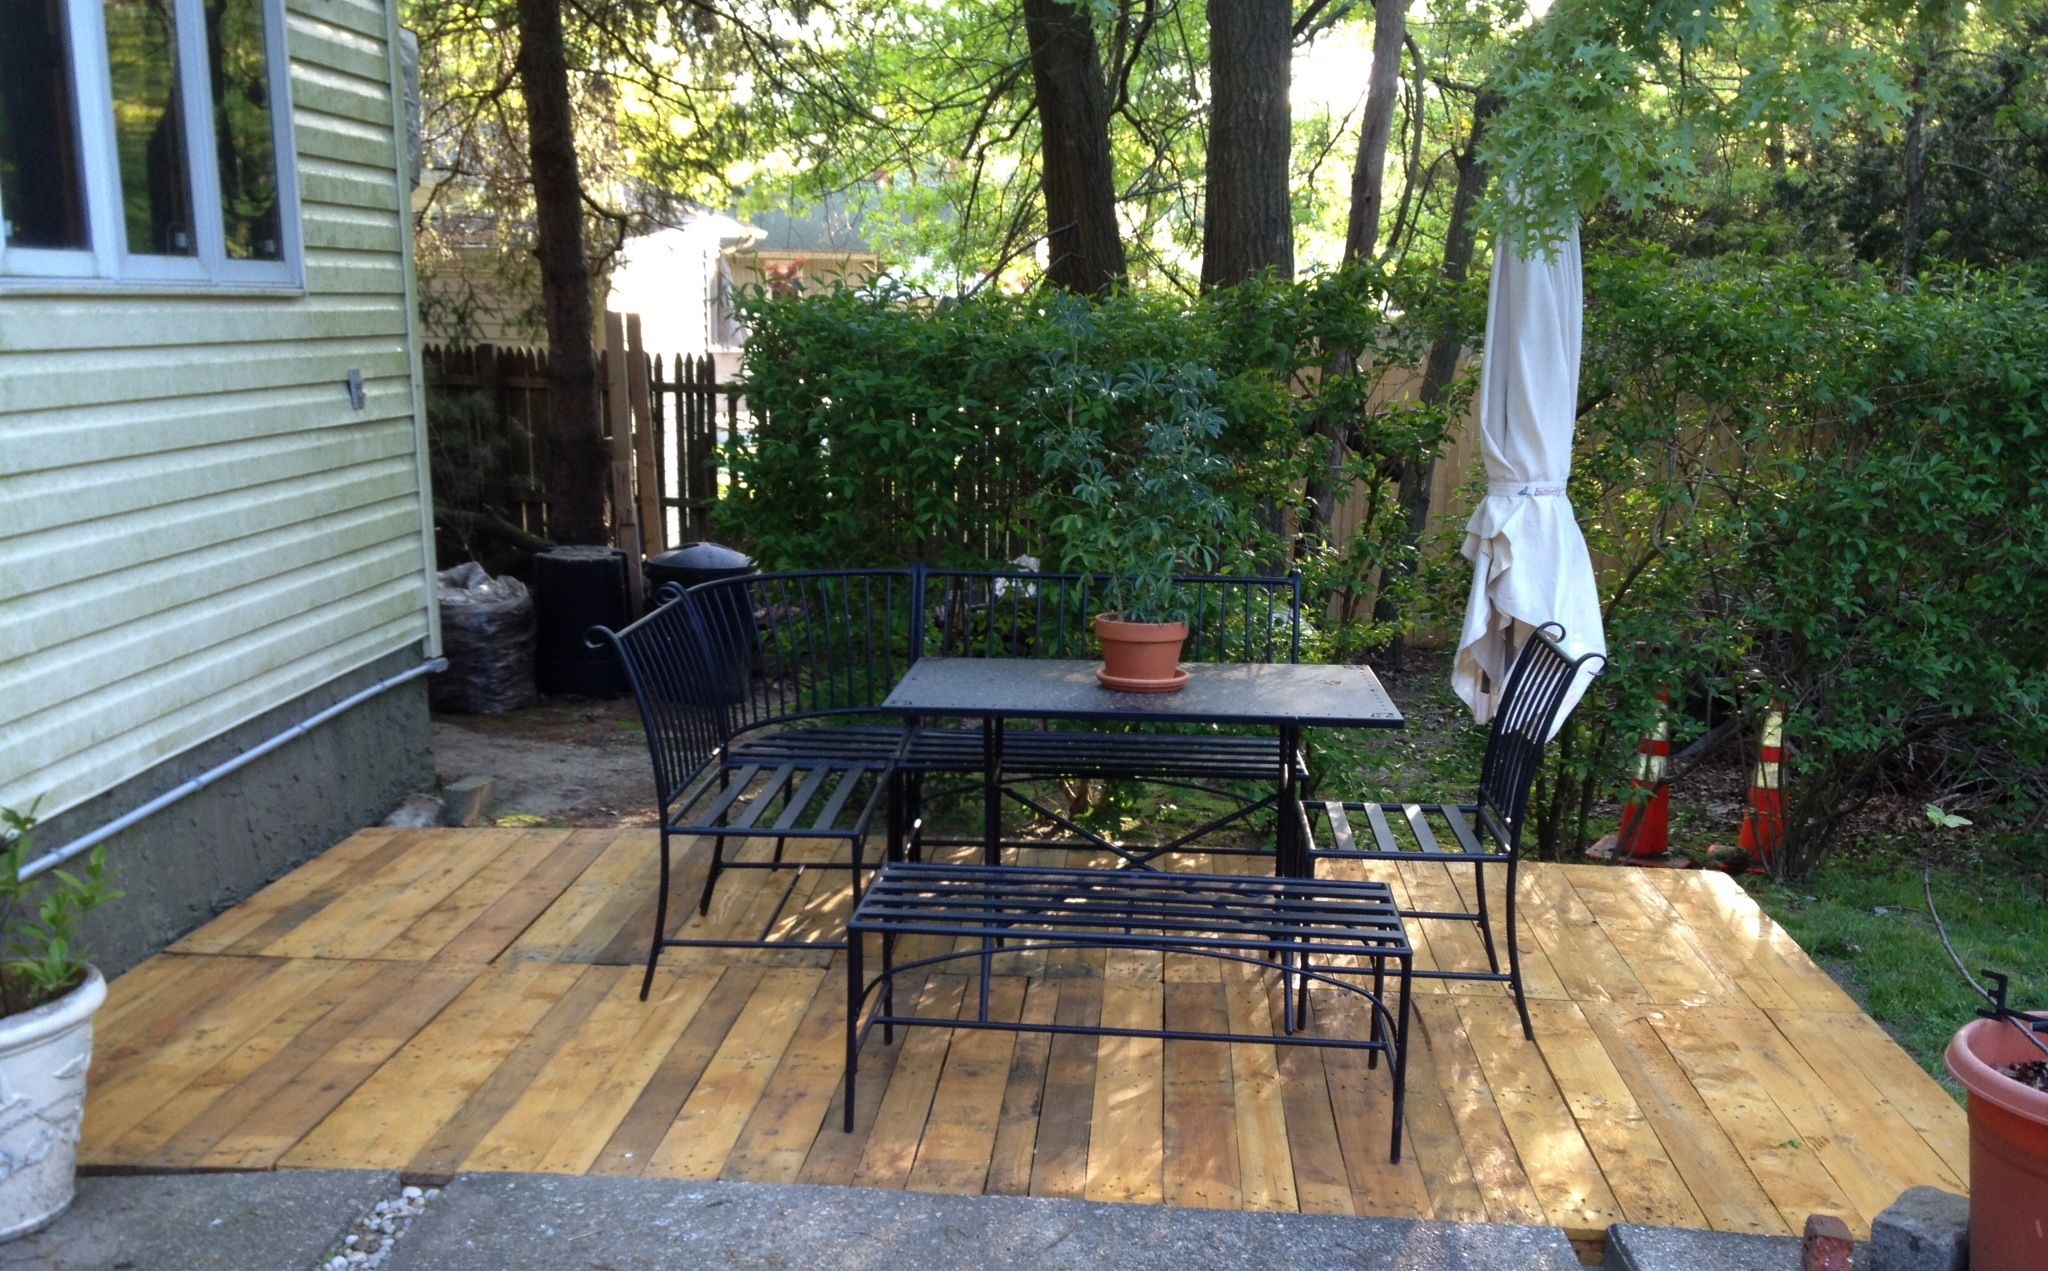 Backyard Pallet Deck Made From 10 Euro Pallets